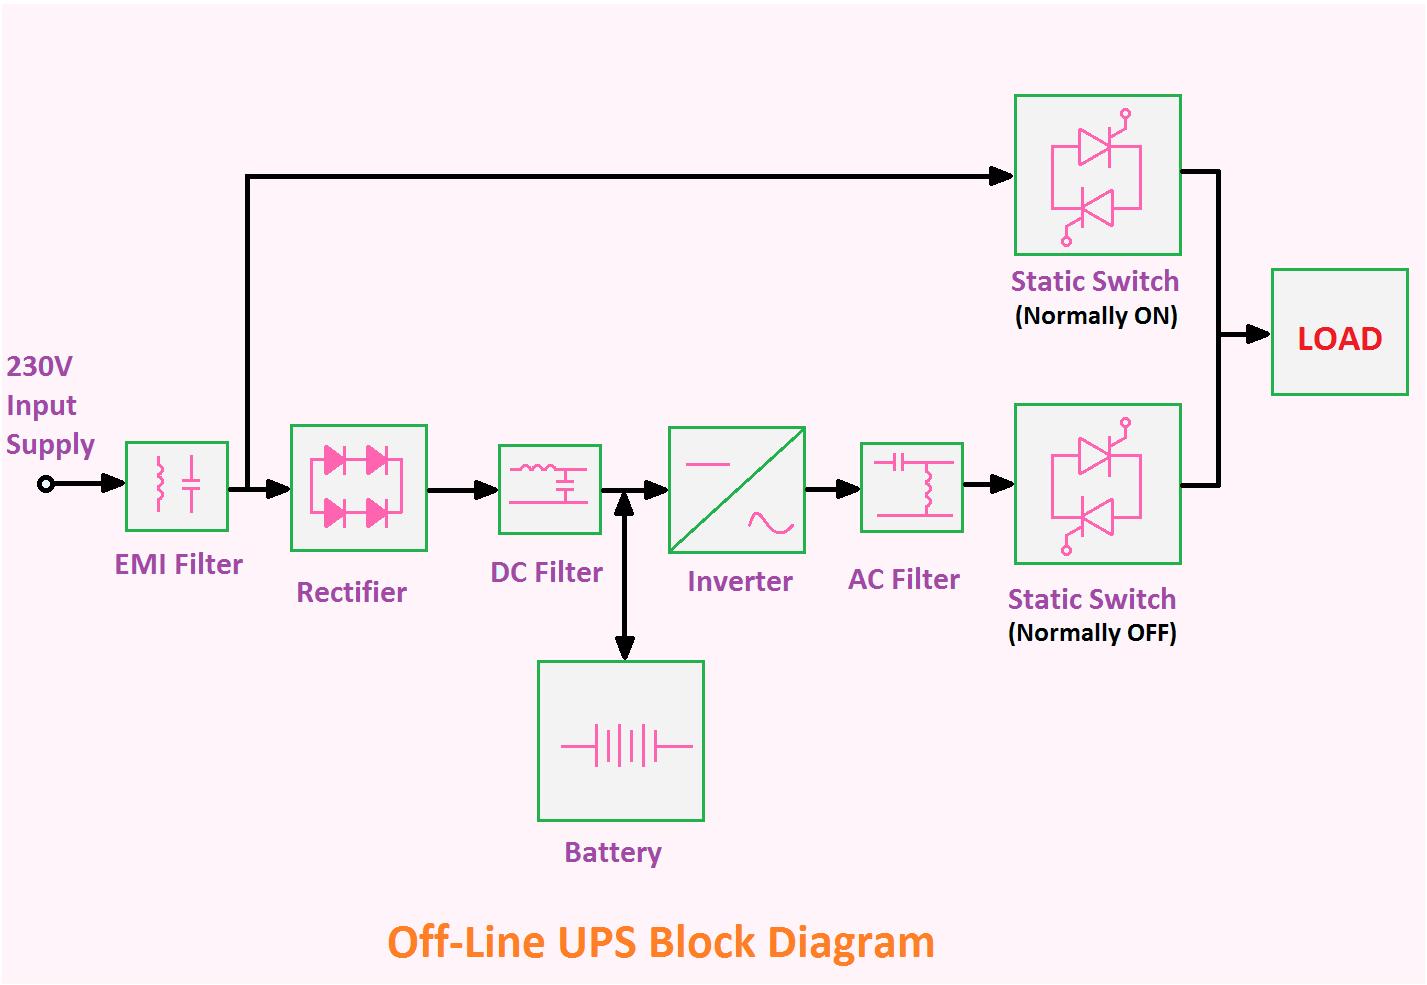 Explained] Offline and Online UPS Block Diagram - ETechnoGETechnoG